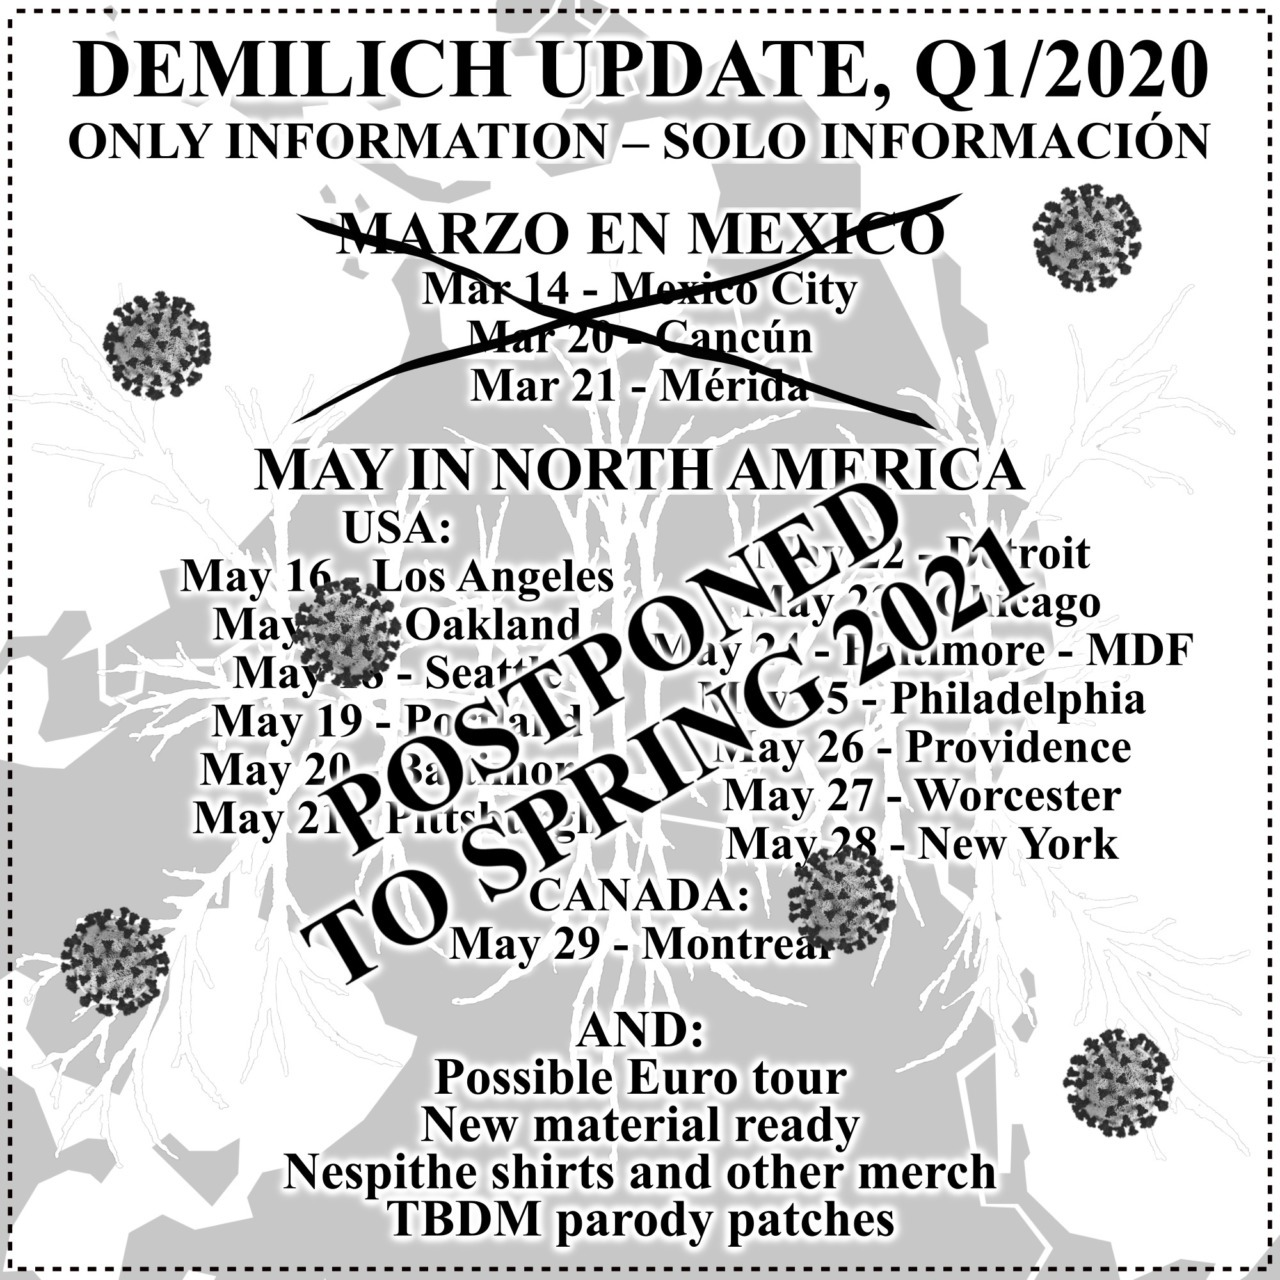 Demilich update, Q1/2020